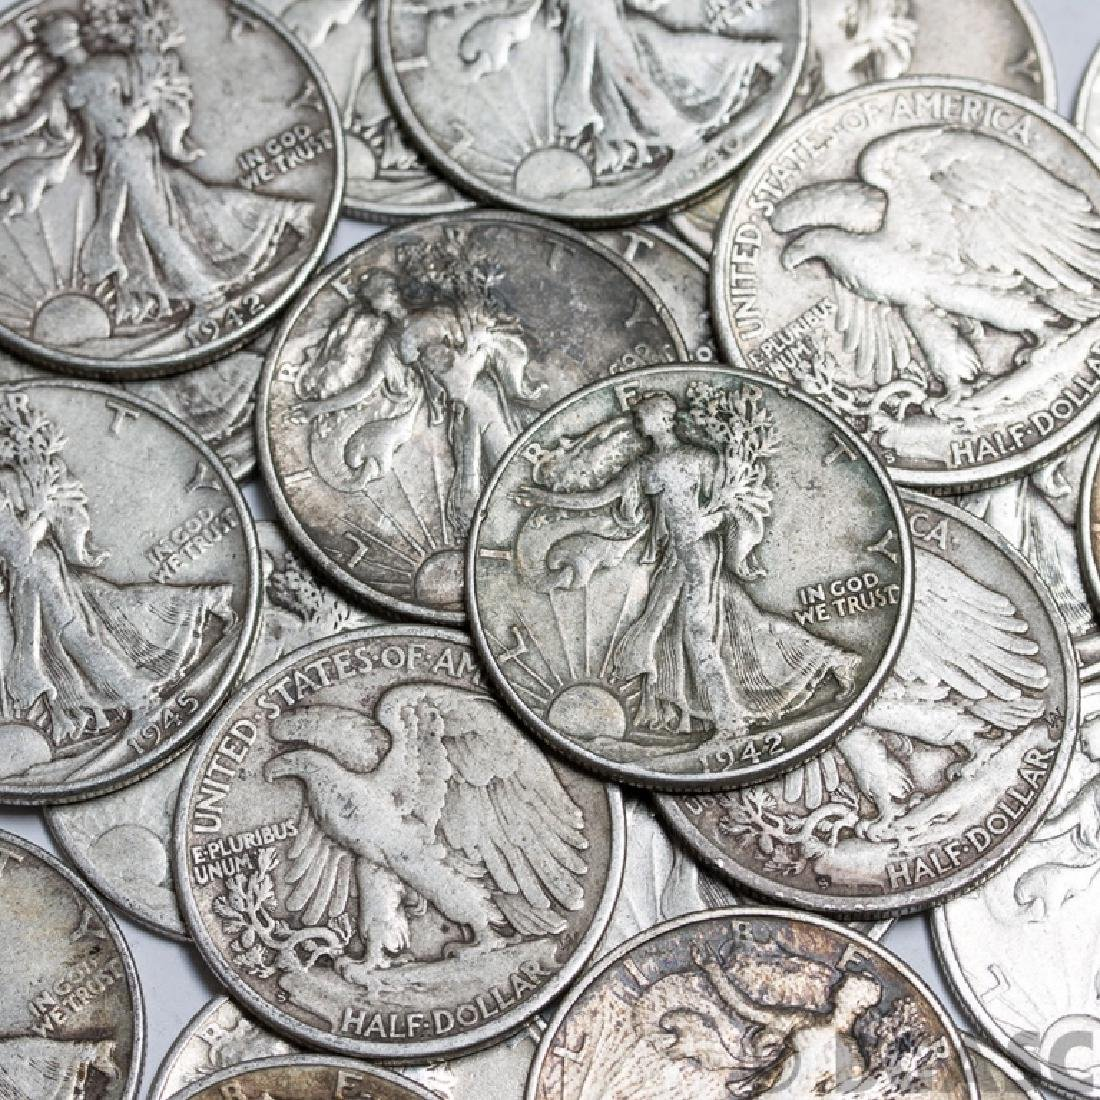 Roll of (20) Walking Liberty Half Dollars